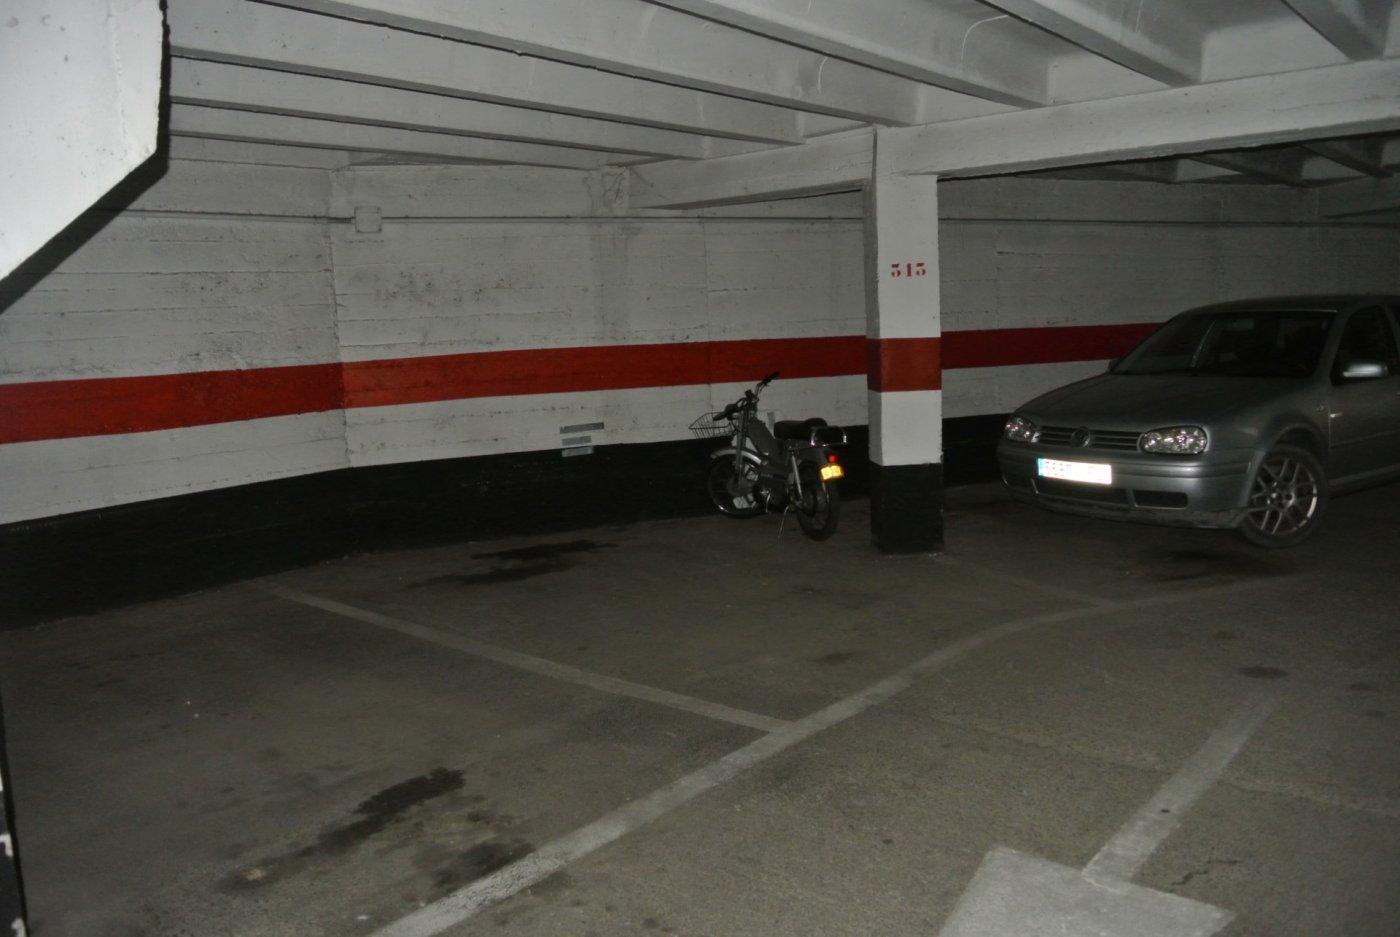 Plaza de garaje en tenor fleta - imagenInmueble4